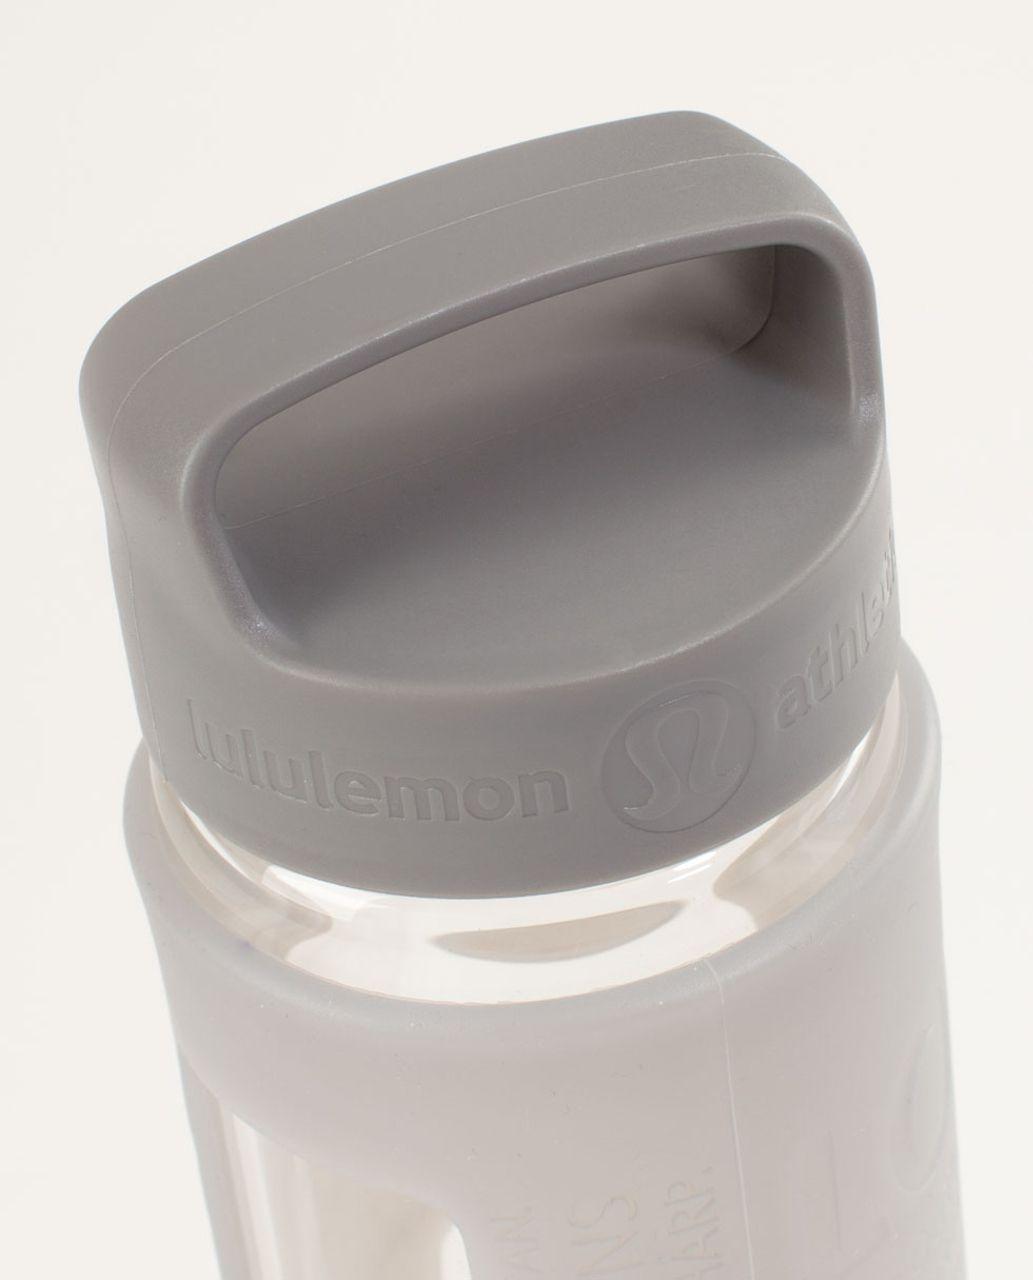 Lululemon Pure Balance Waterbottle - Fossil